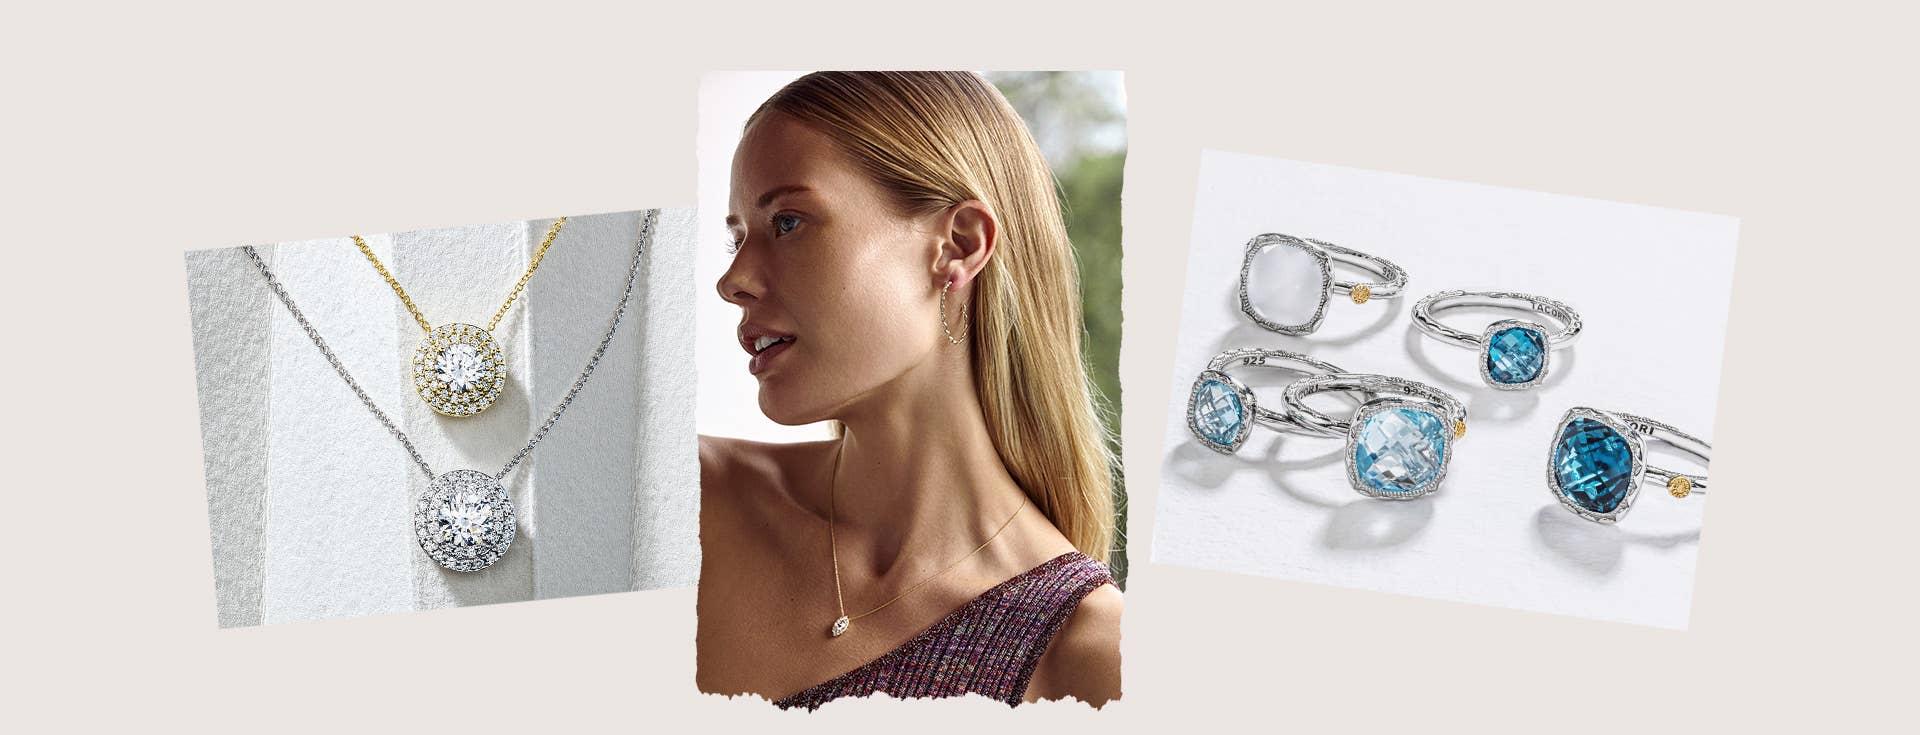 Images of Tacori Jewelry